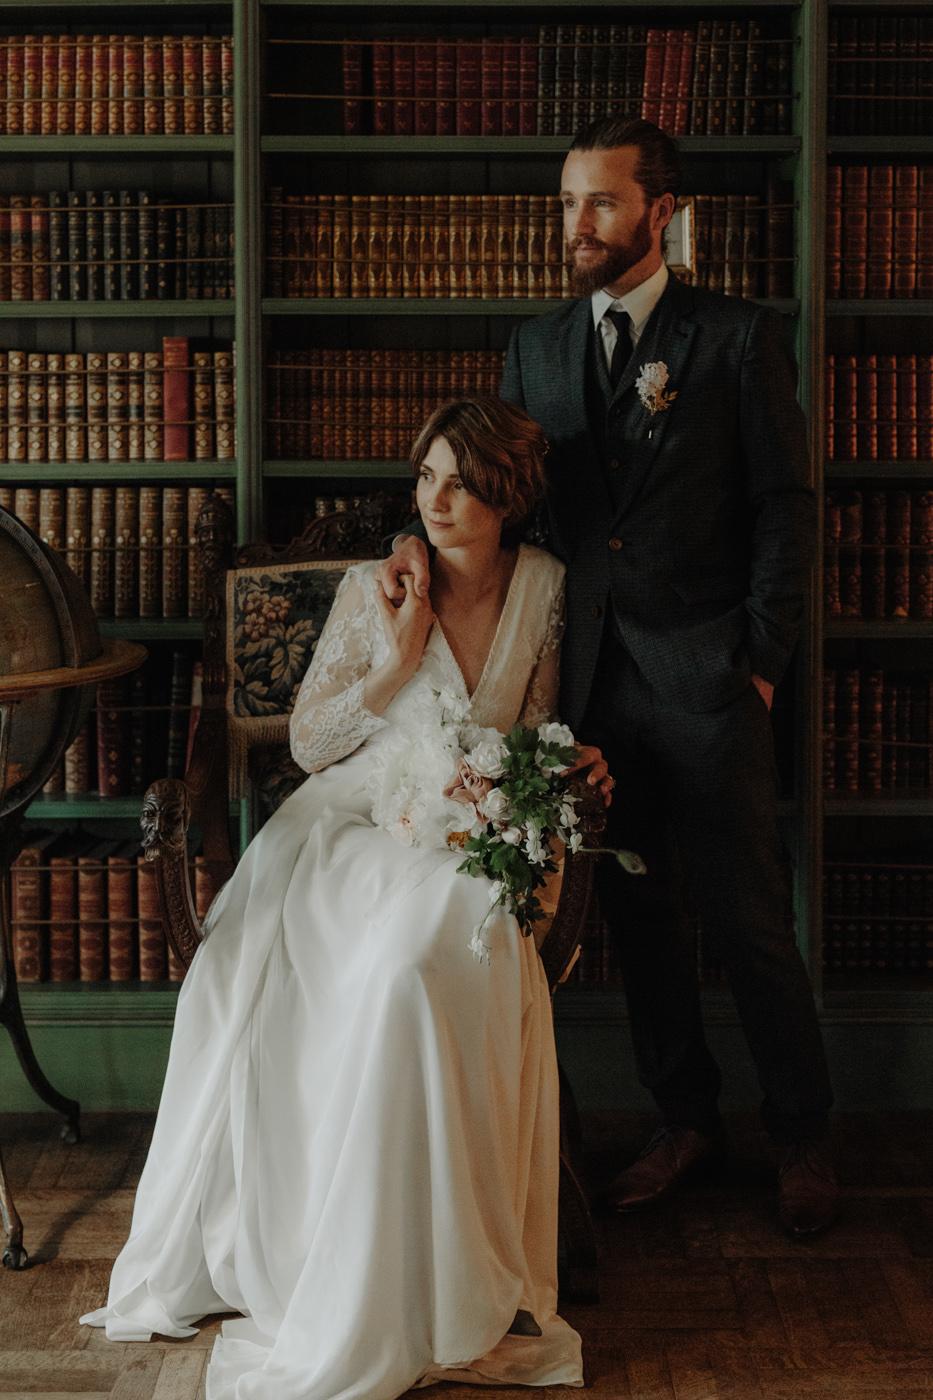 Erin-Mike-Intimate-Vintage-Wedding-Shelburne-Farms-Vermont -140.jpg